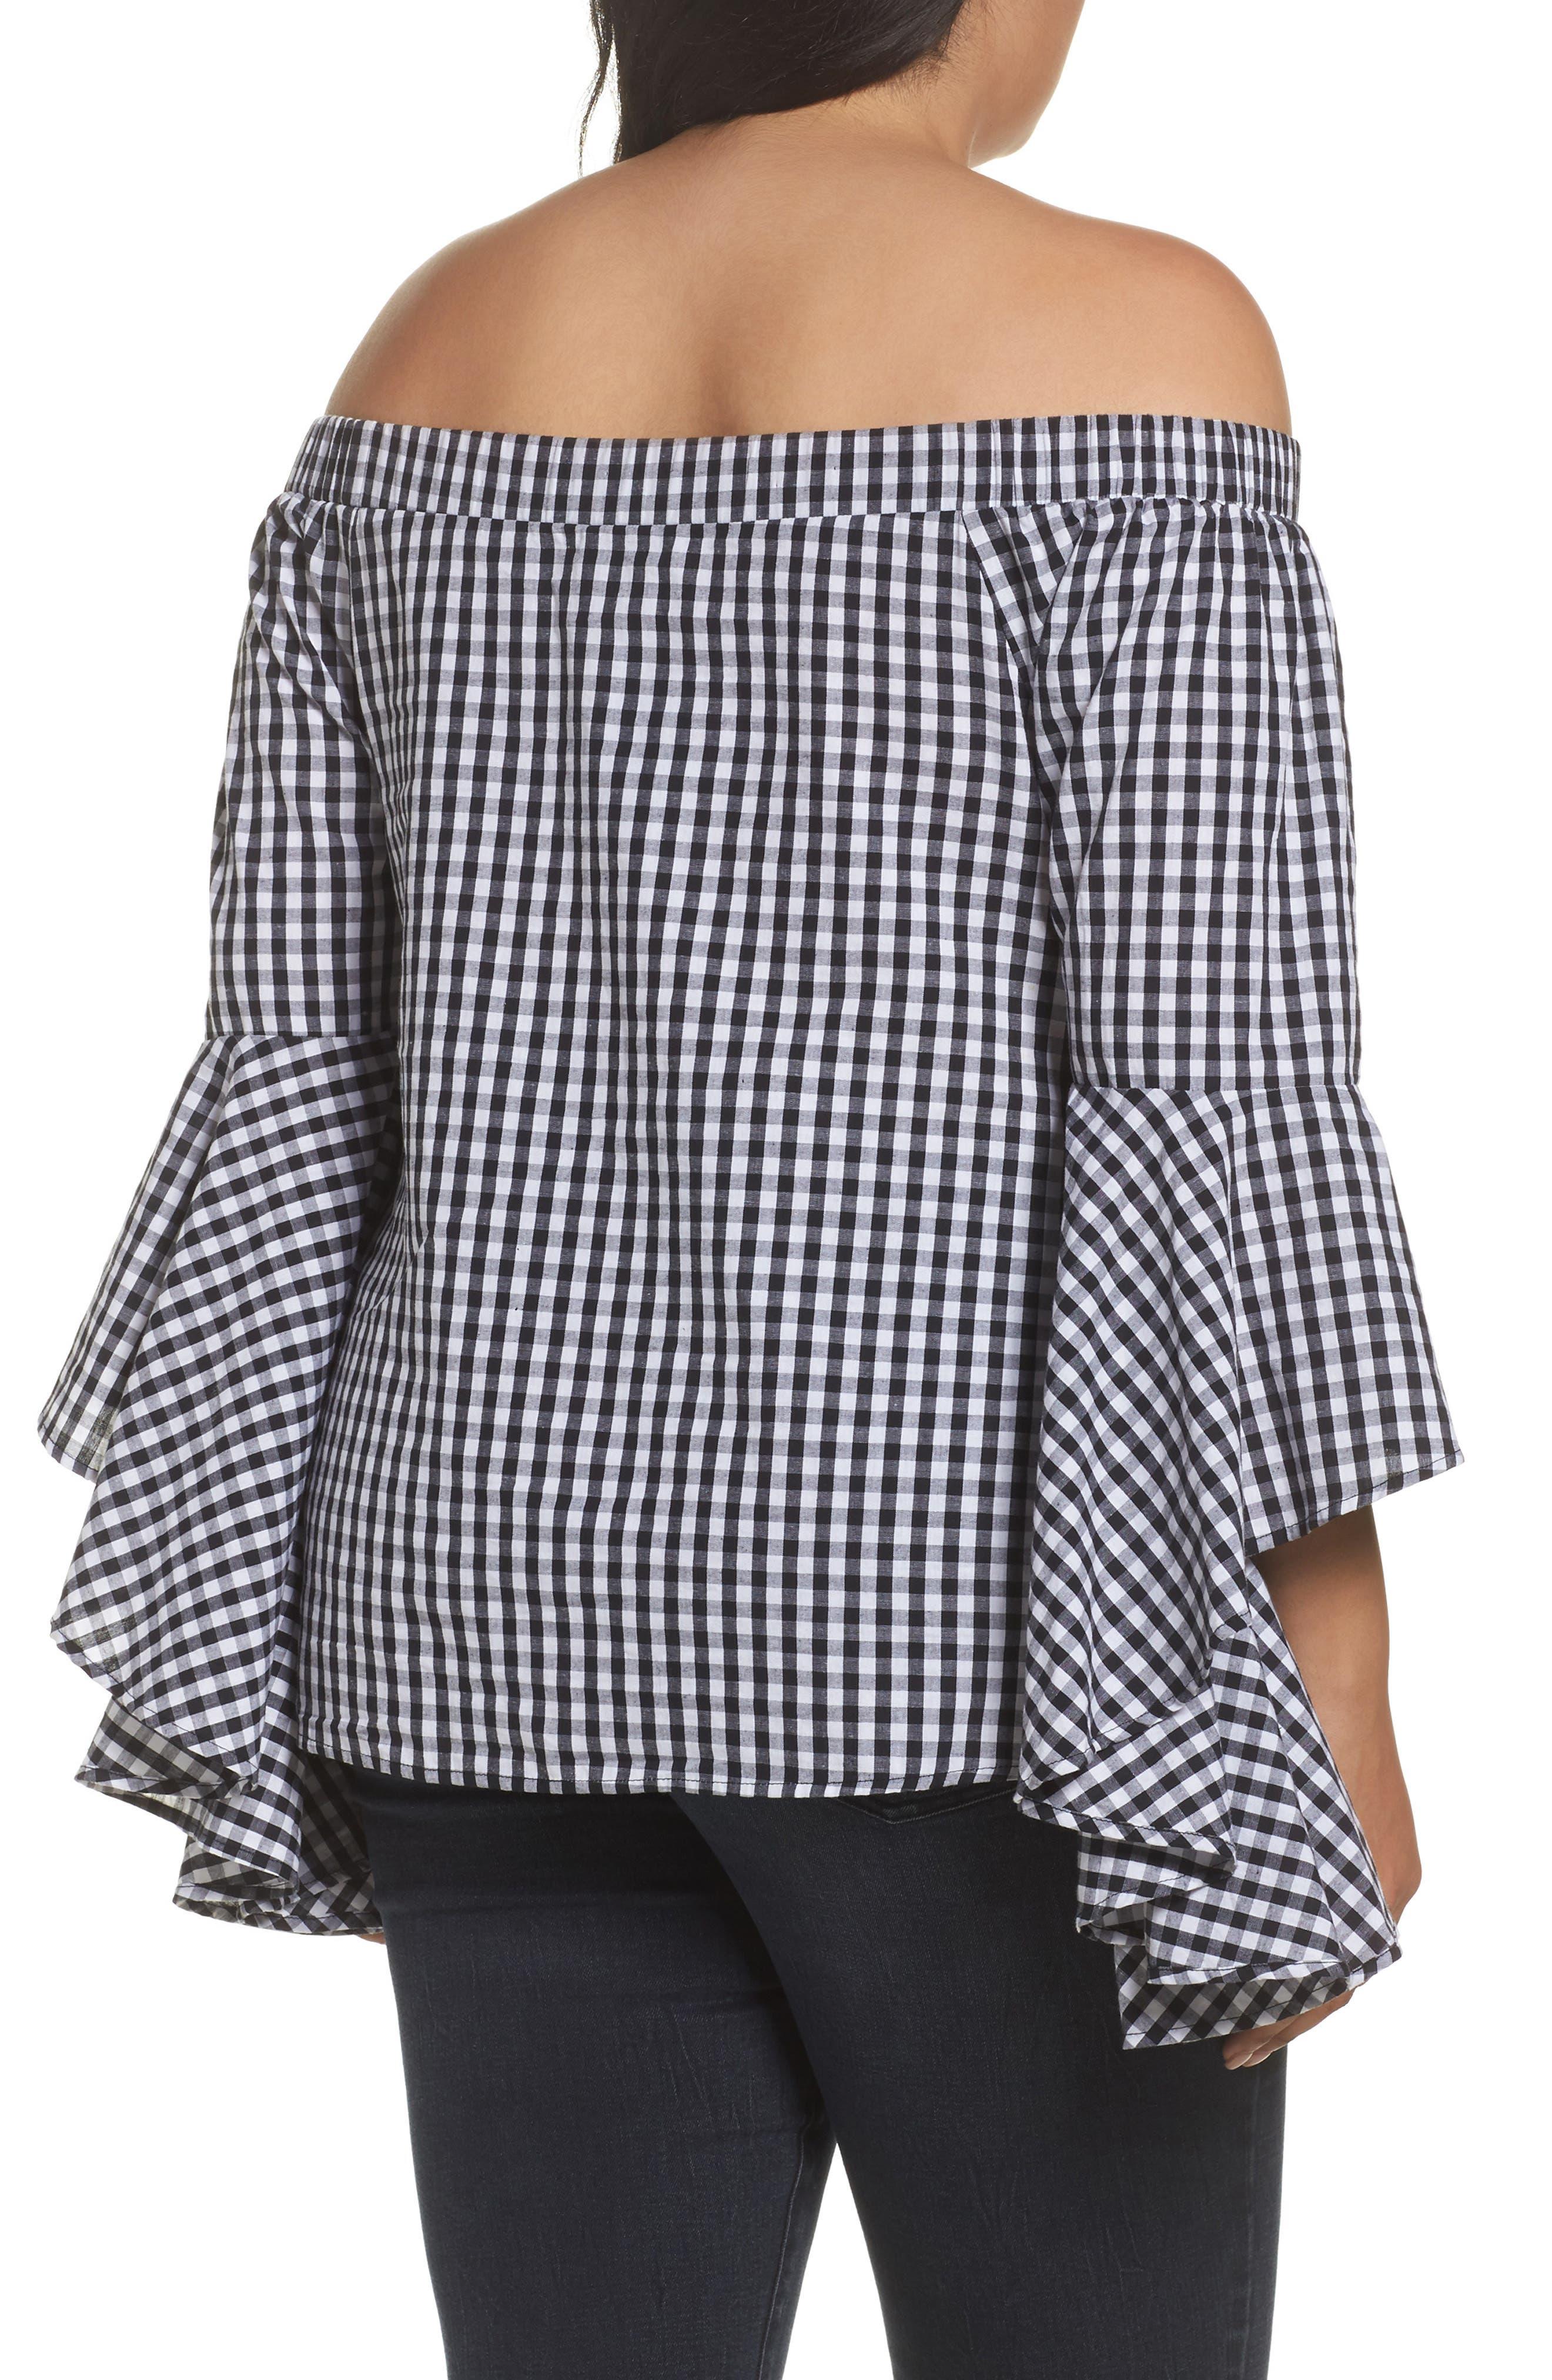 Bell Sleeve Off the Shoulder Shirt,                             Alternate thumbnail 3, color,                             Black / White